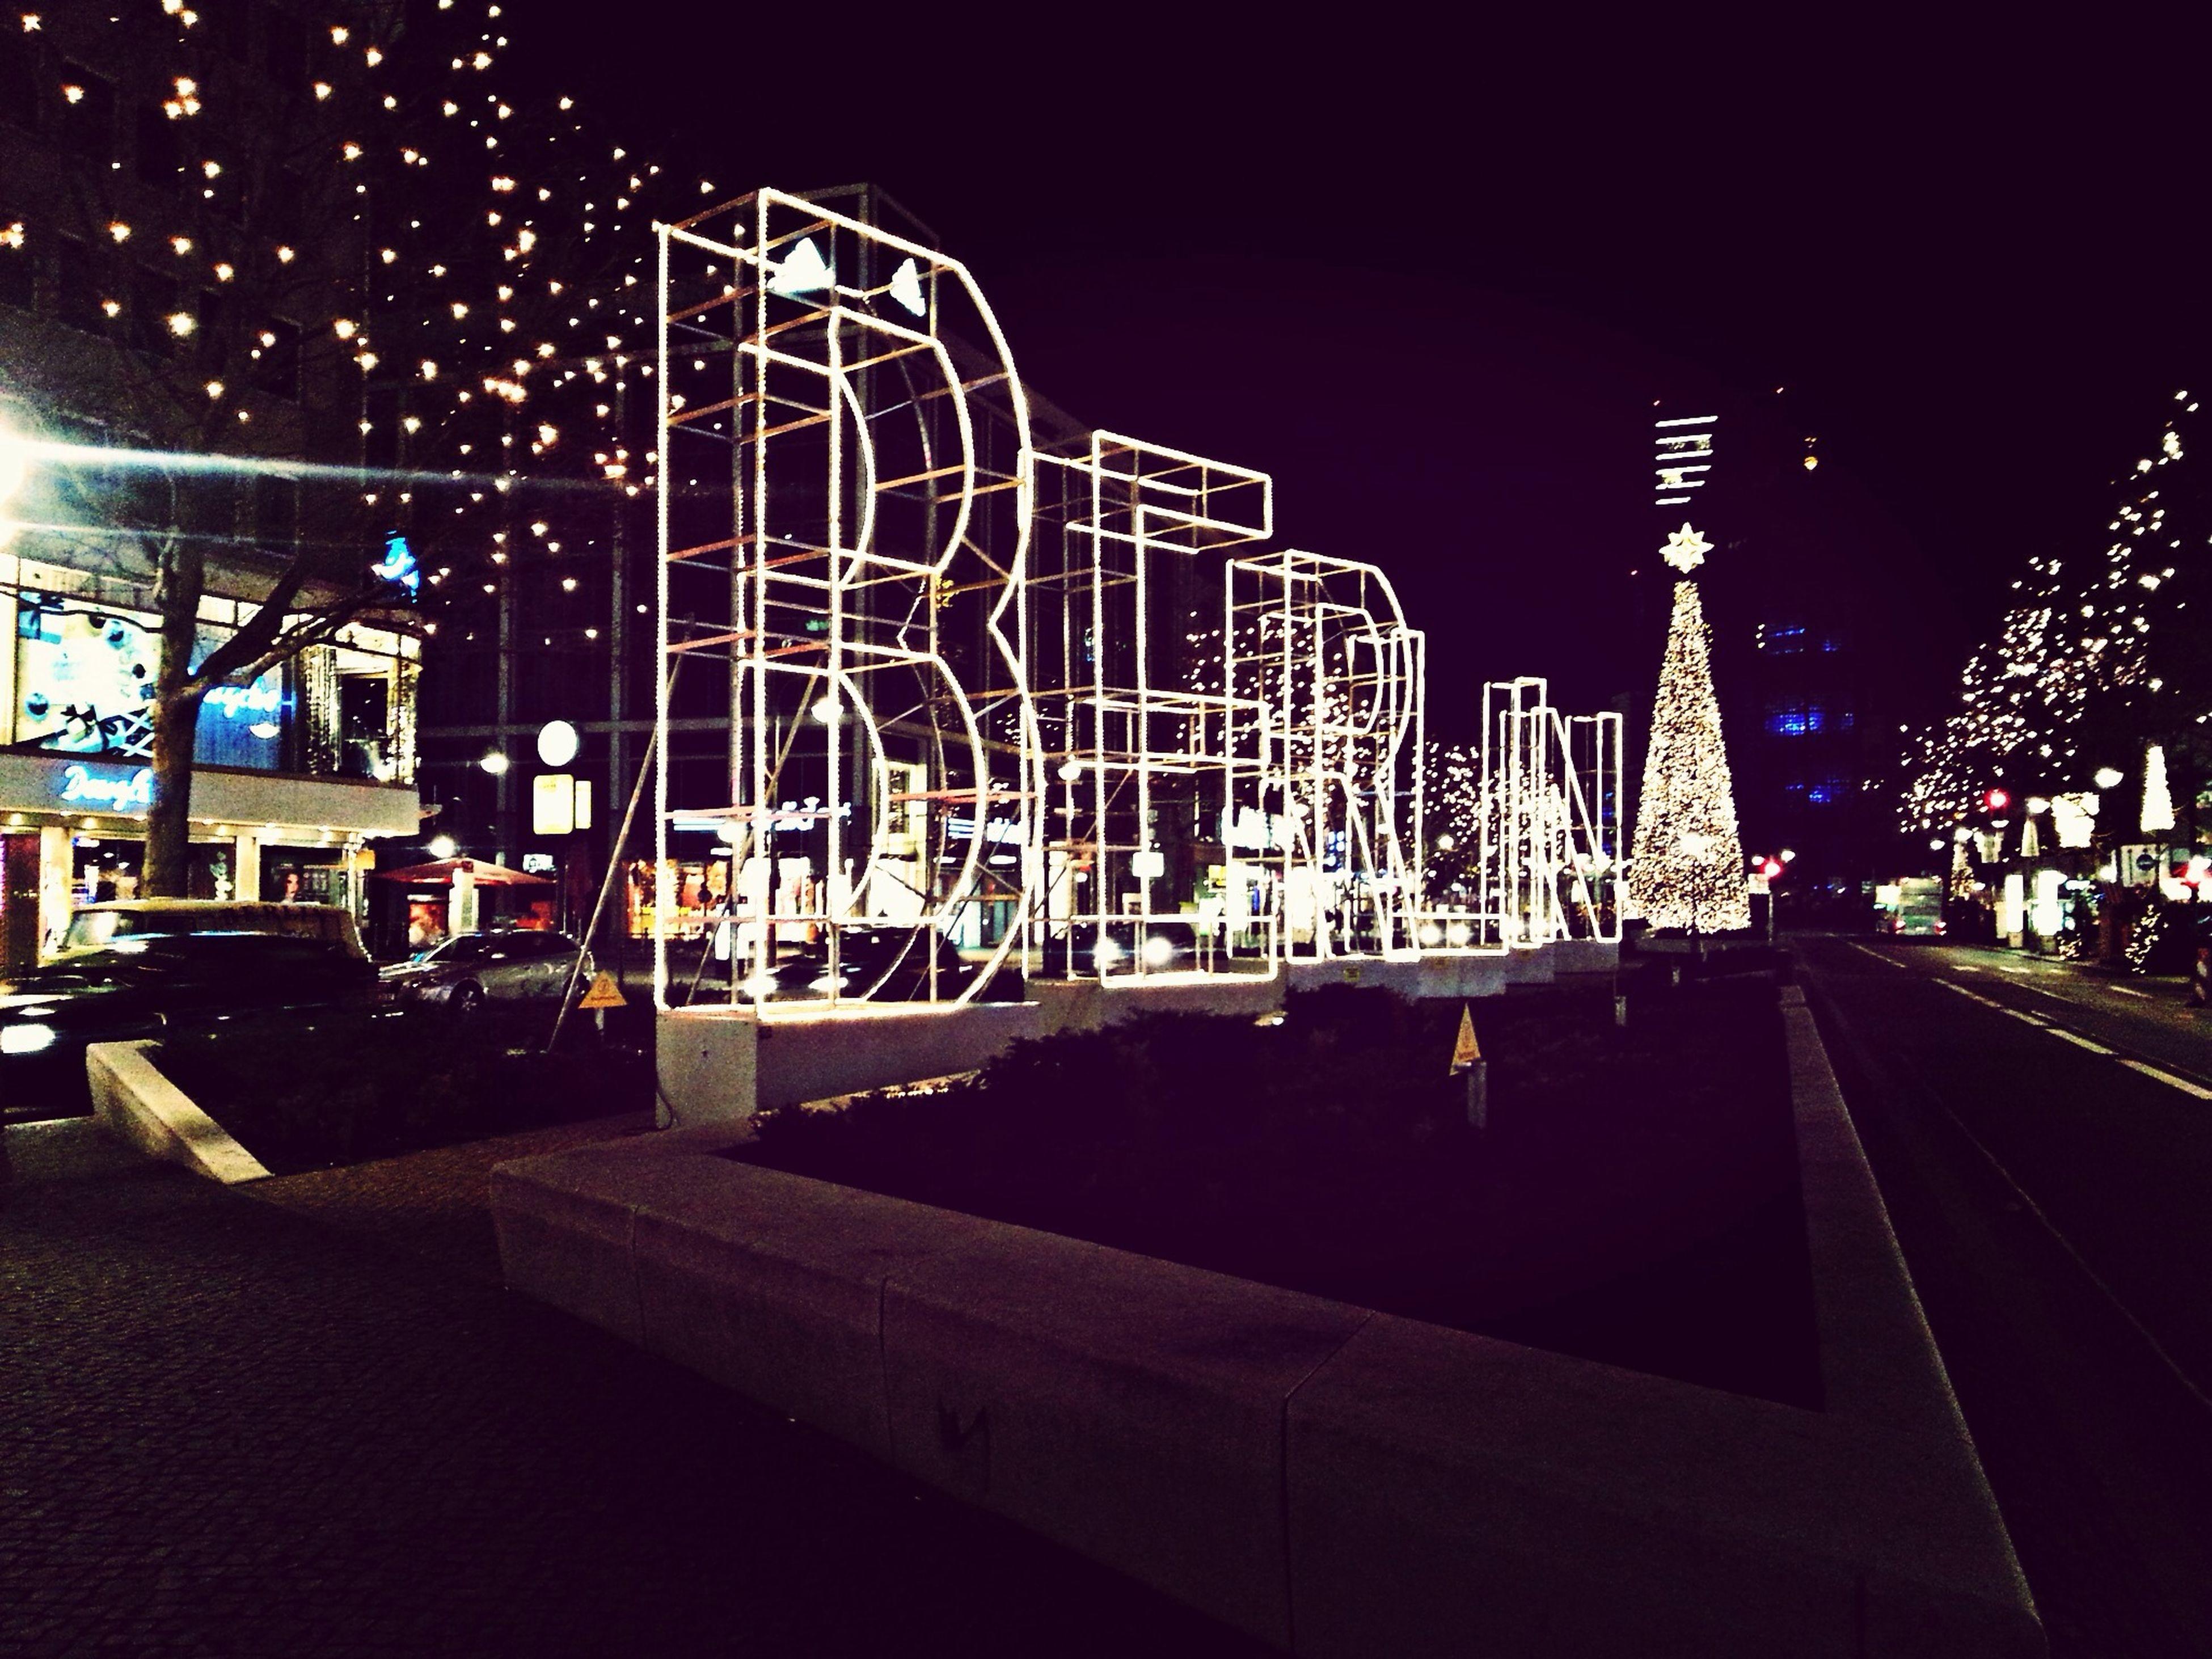 Street Photography Night Lights Christmas City